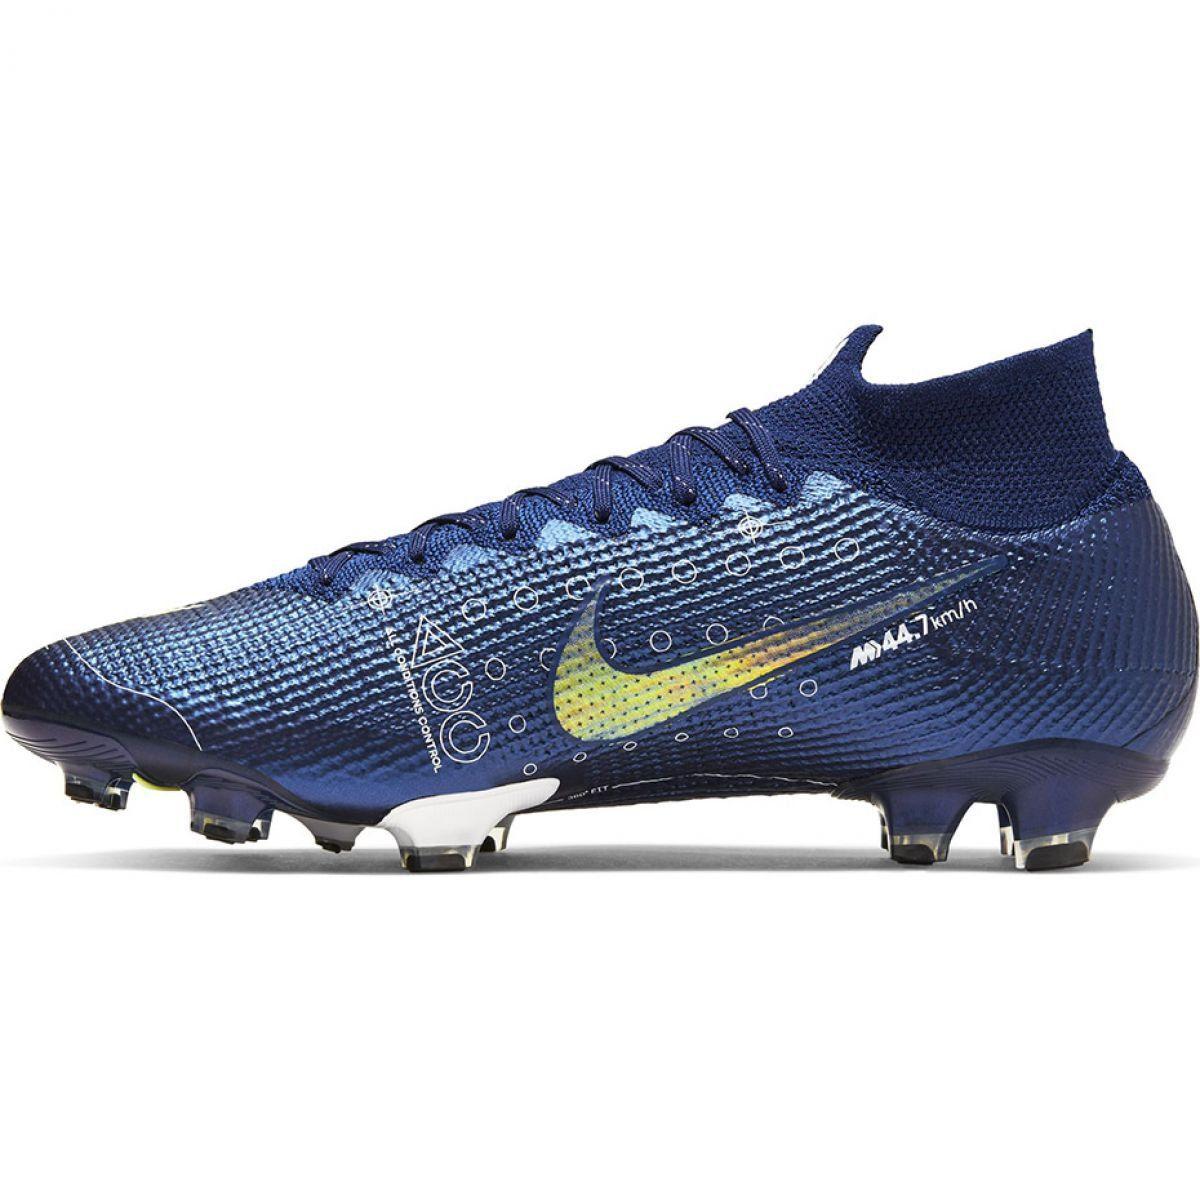 Corks Football Sport Nike Nike Mercurial Superfly 7 Elite Mds Fg M Bq5469 401 Football Shoes Blue Blue Football Boots Boots Football Shoes